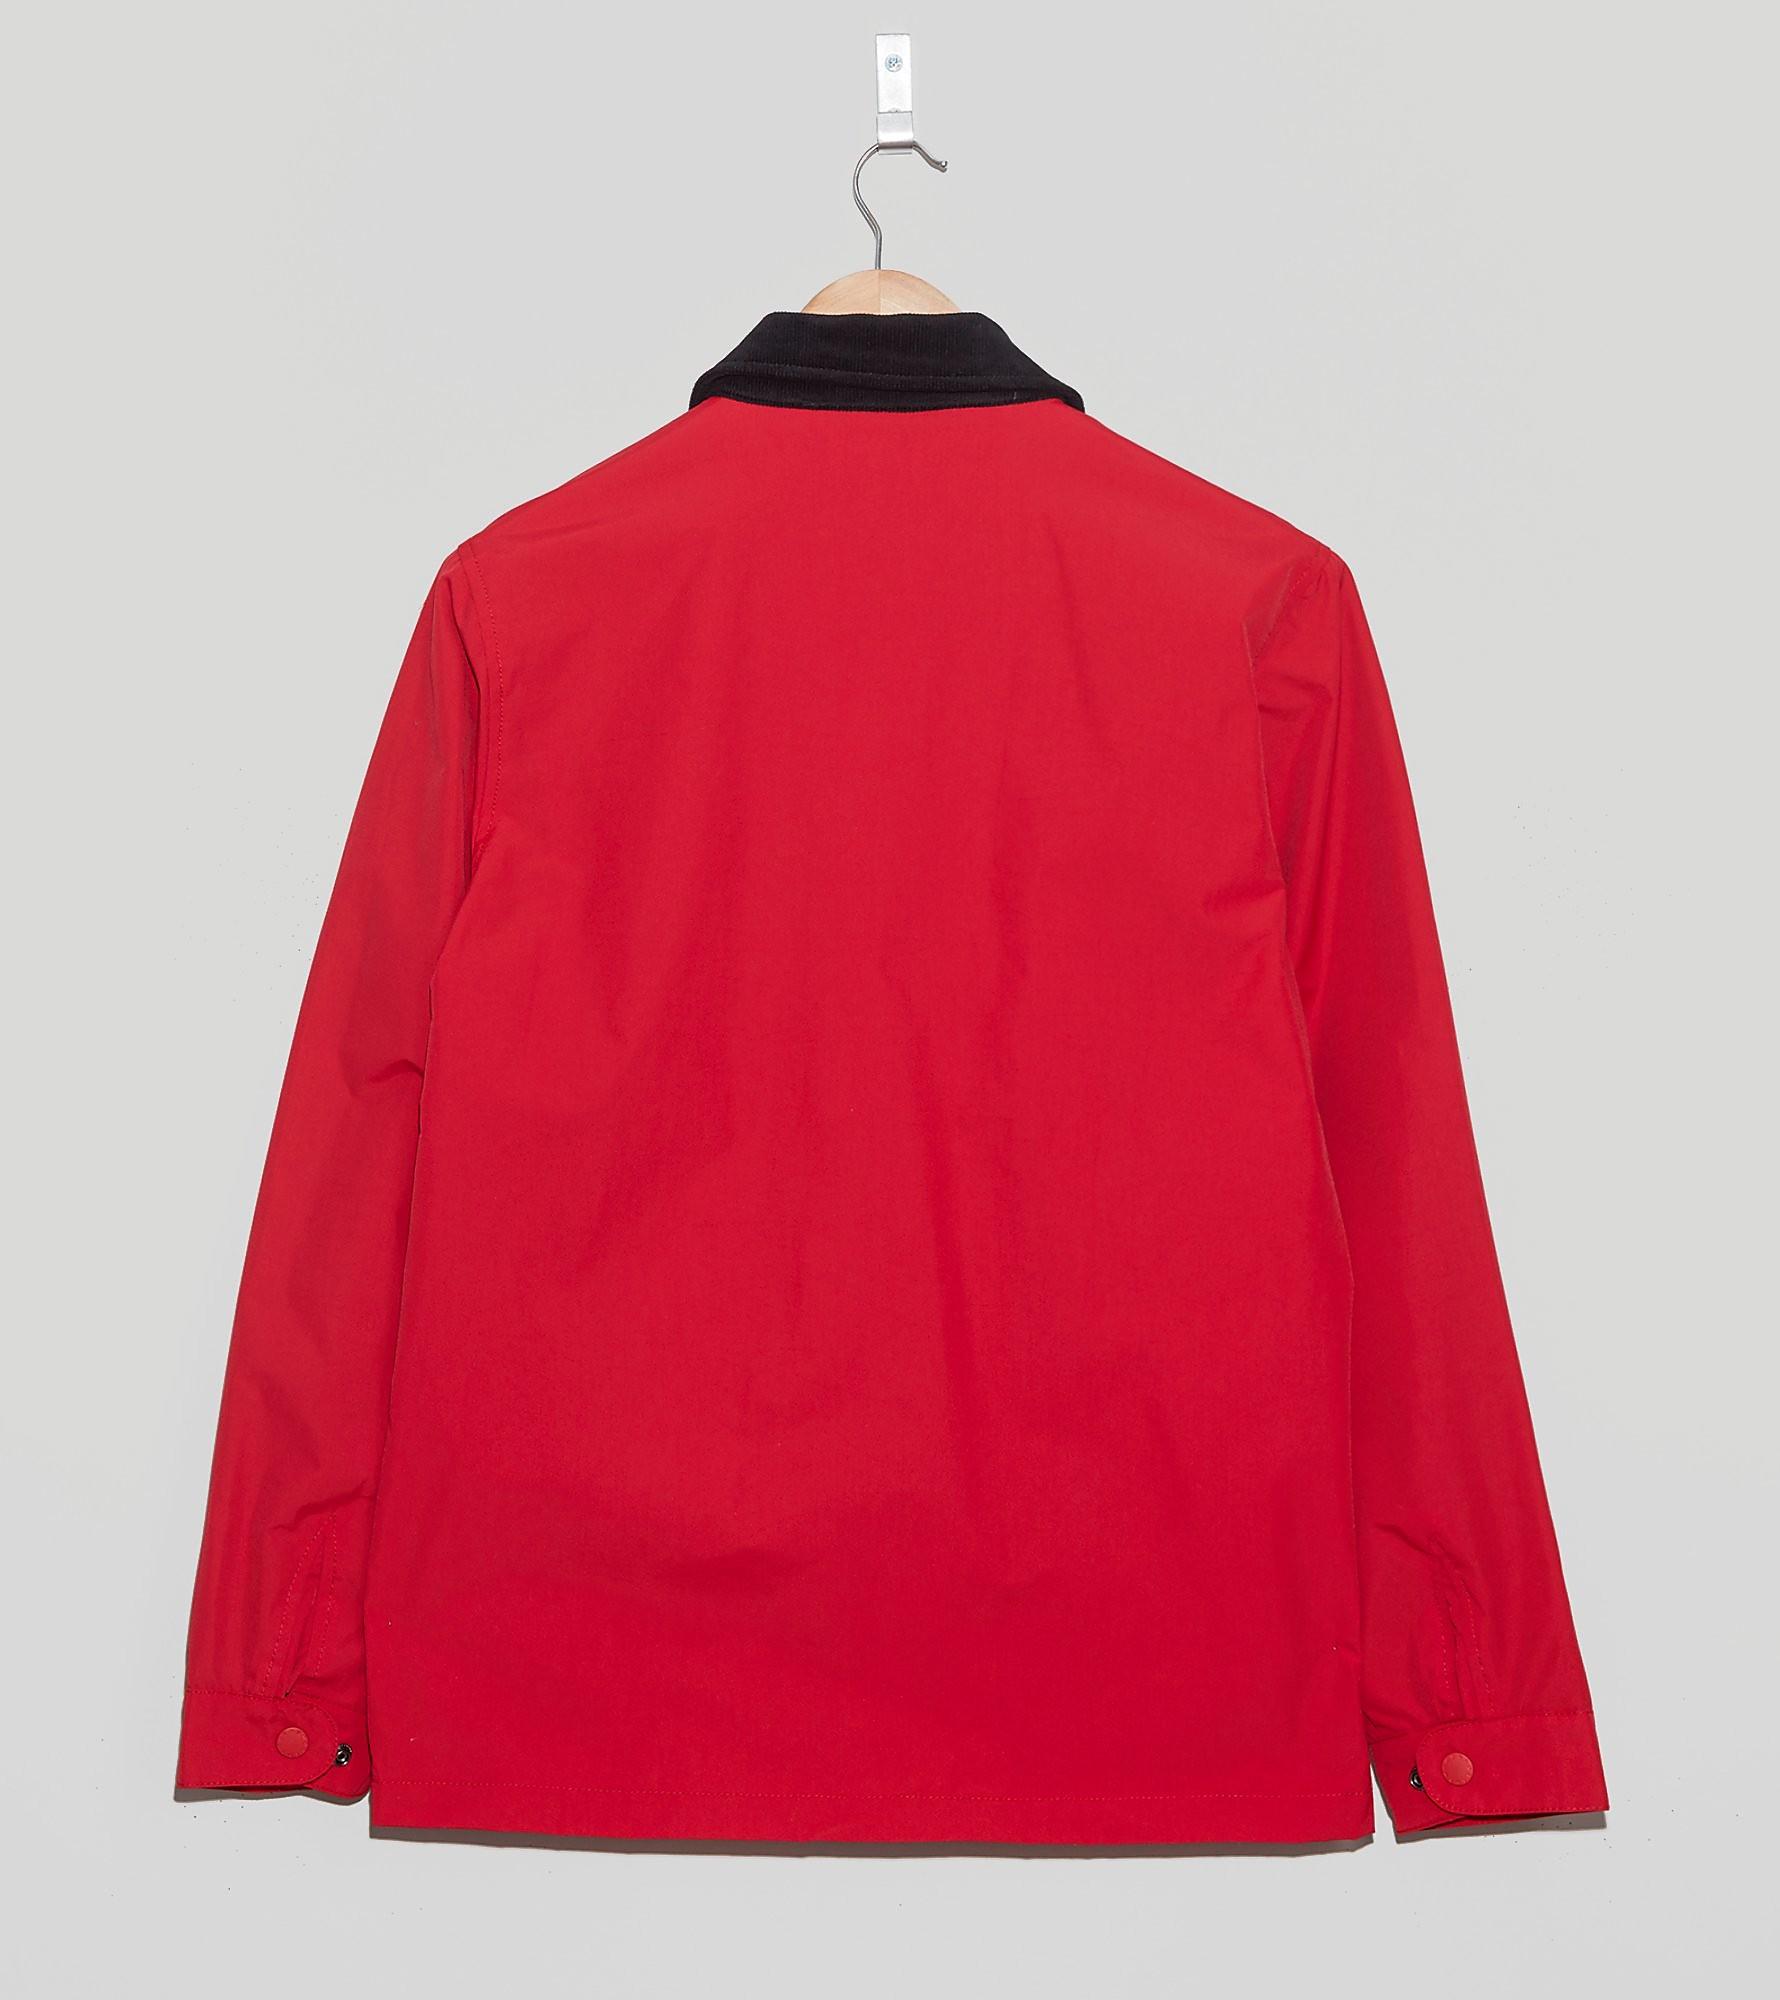 The Hundreds Feather Jacket